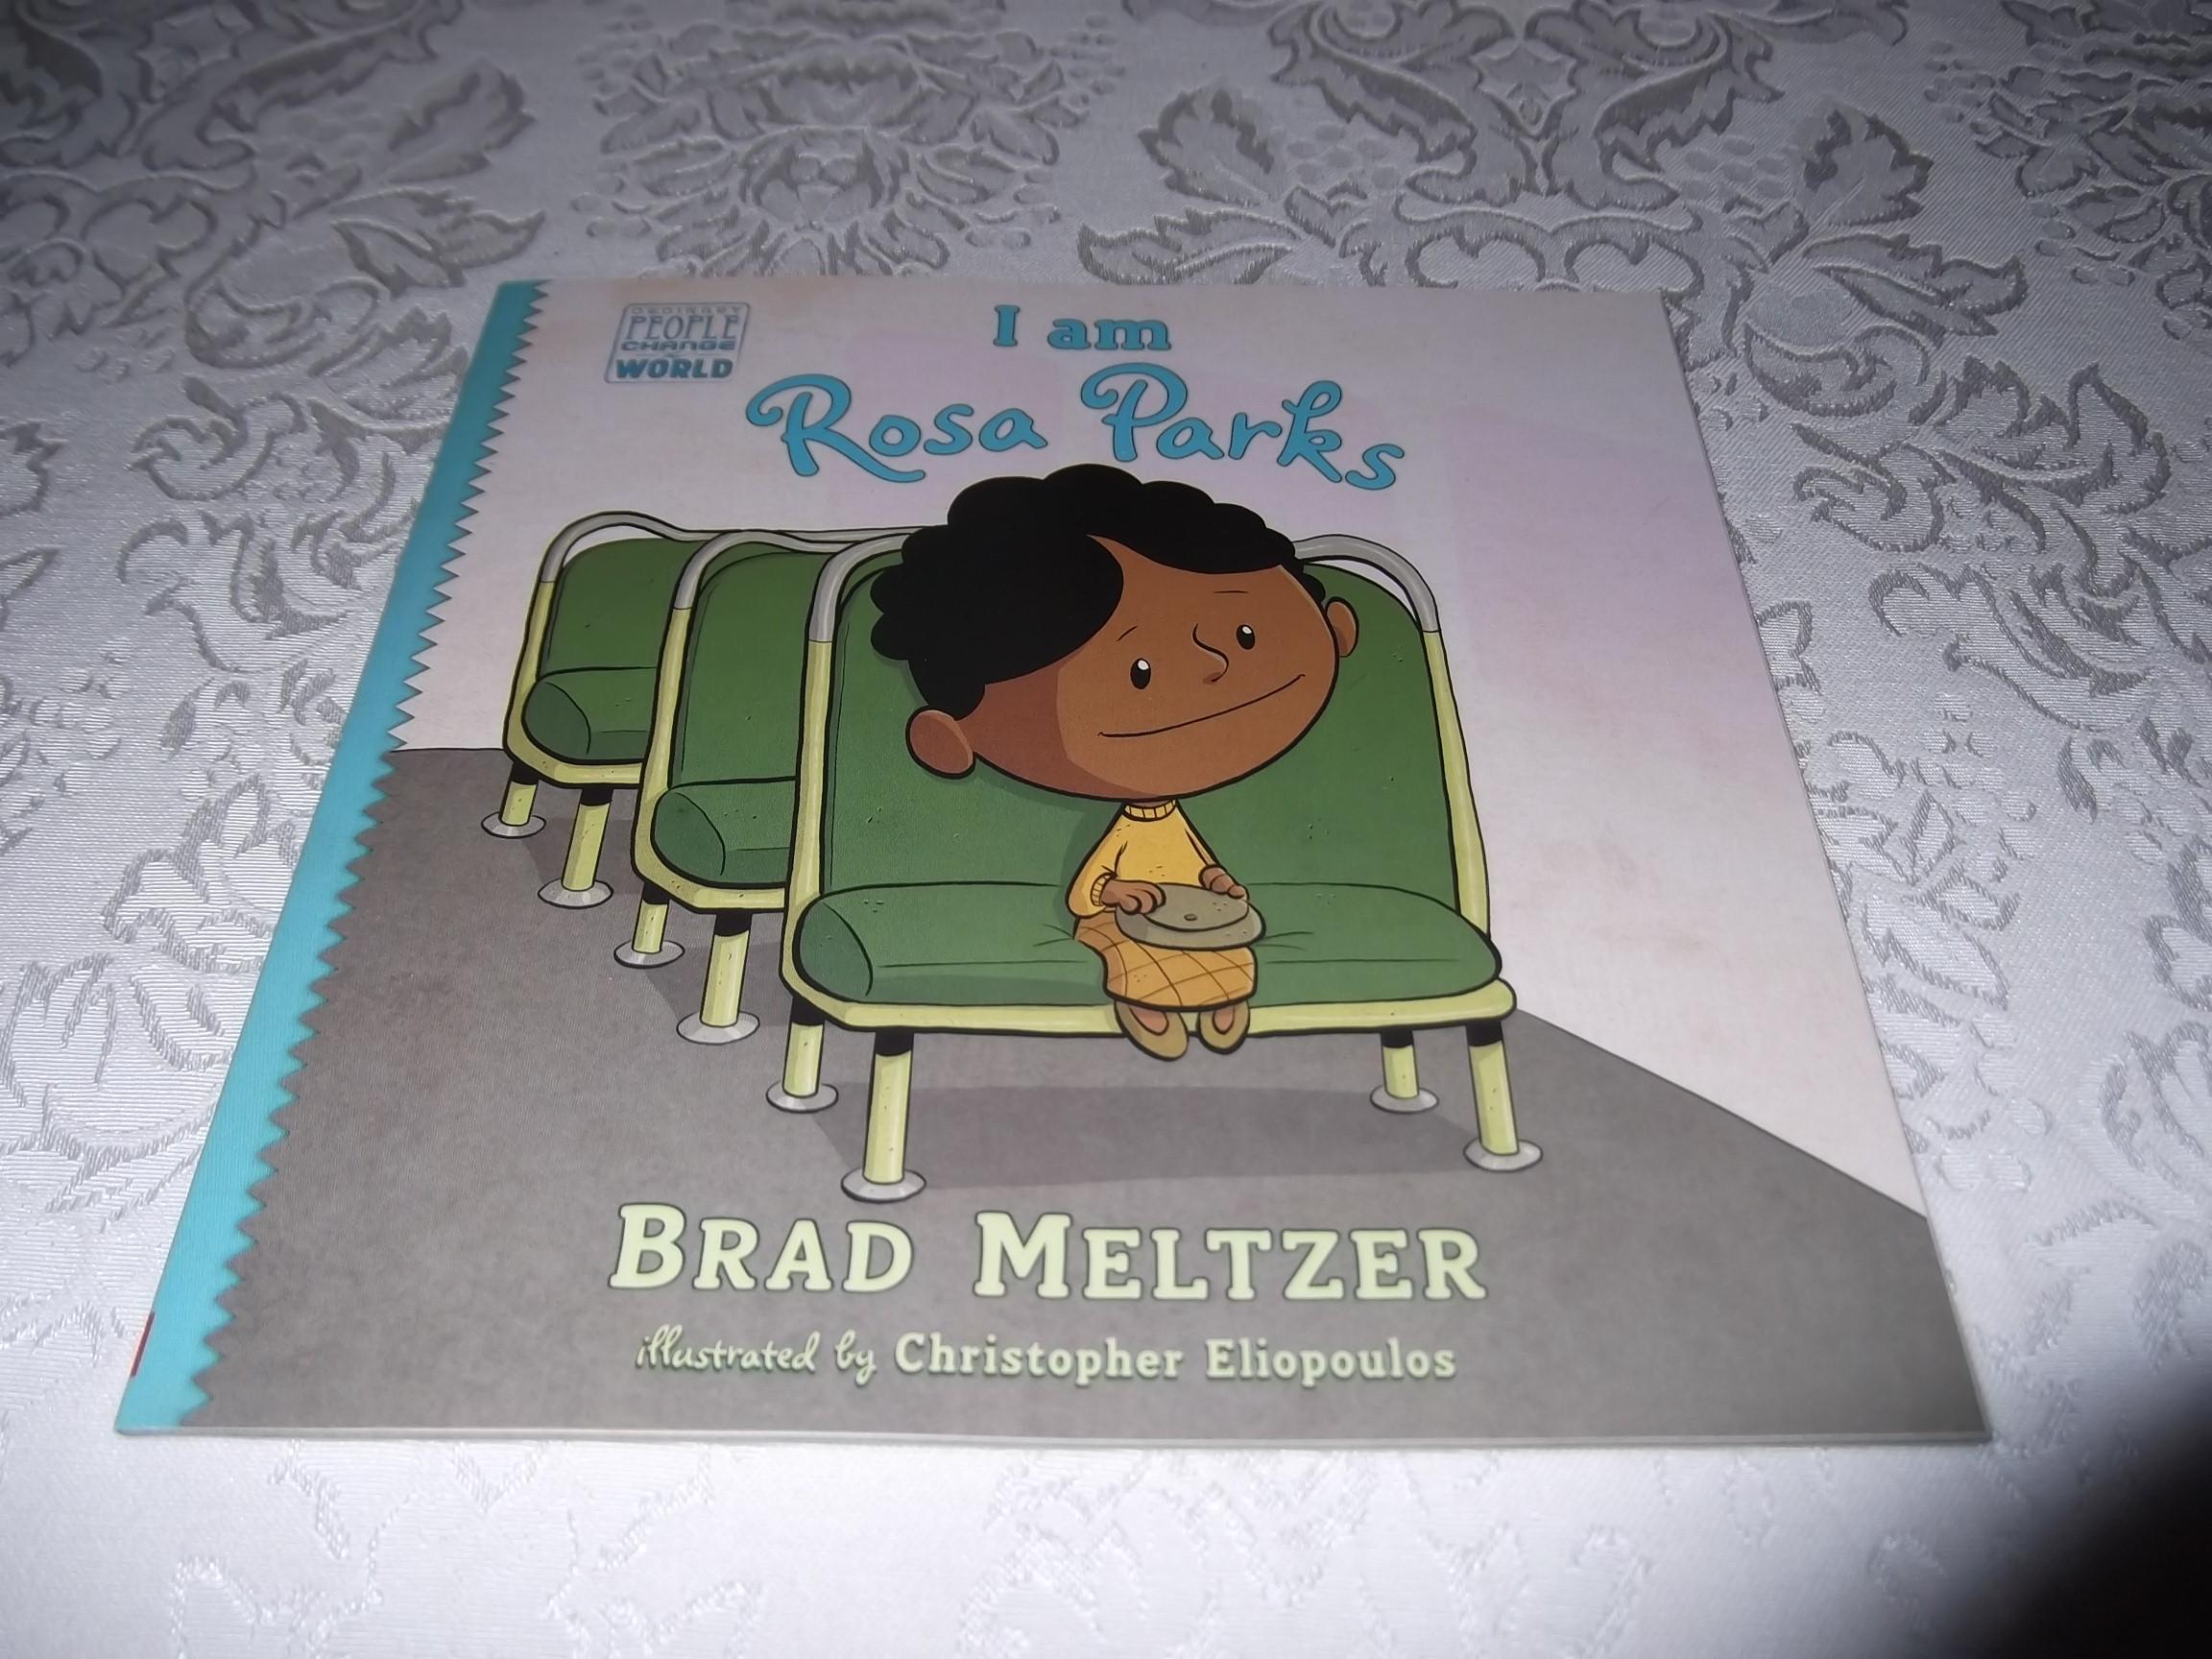 I am Rosa Parks Brad Meltzer Brand New SC Ordinary People Change The World